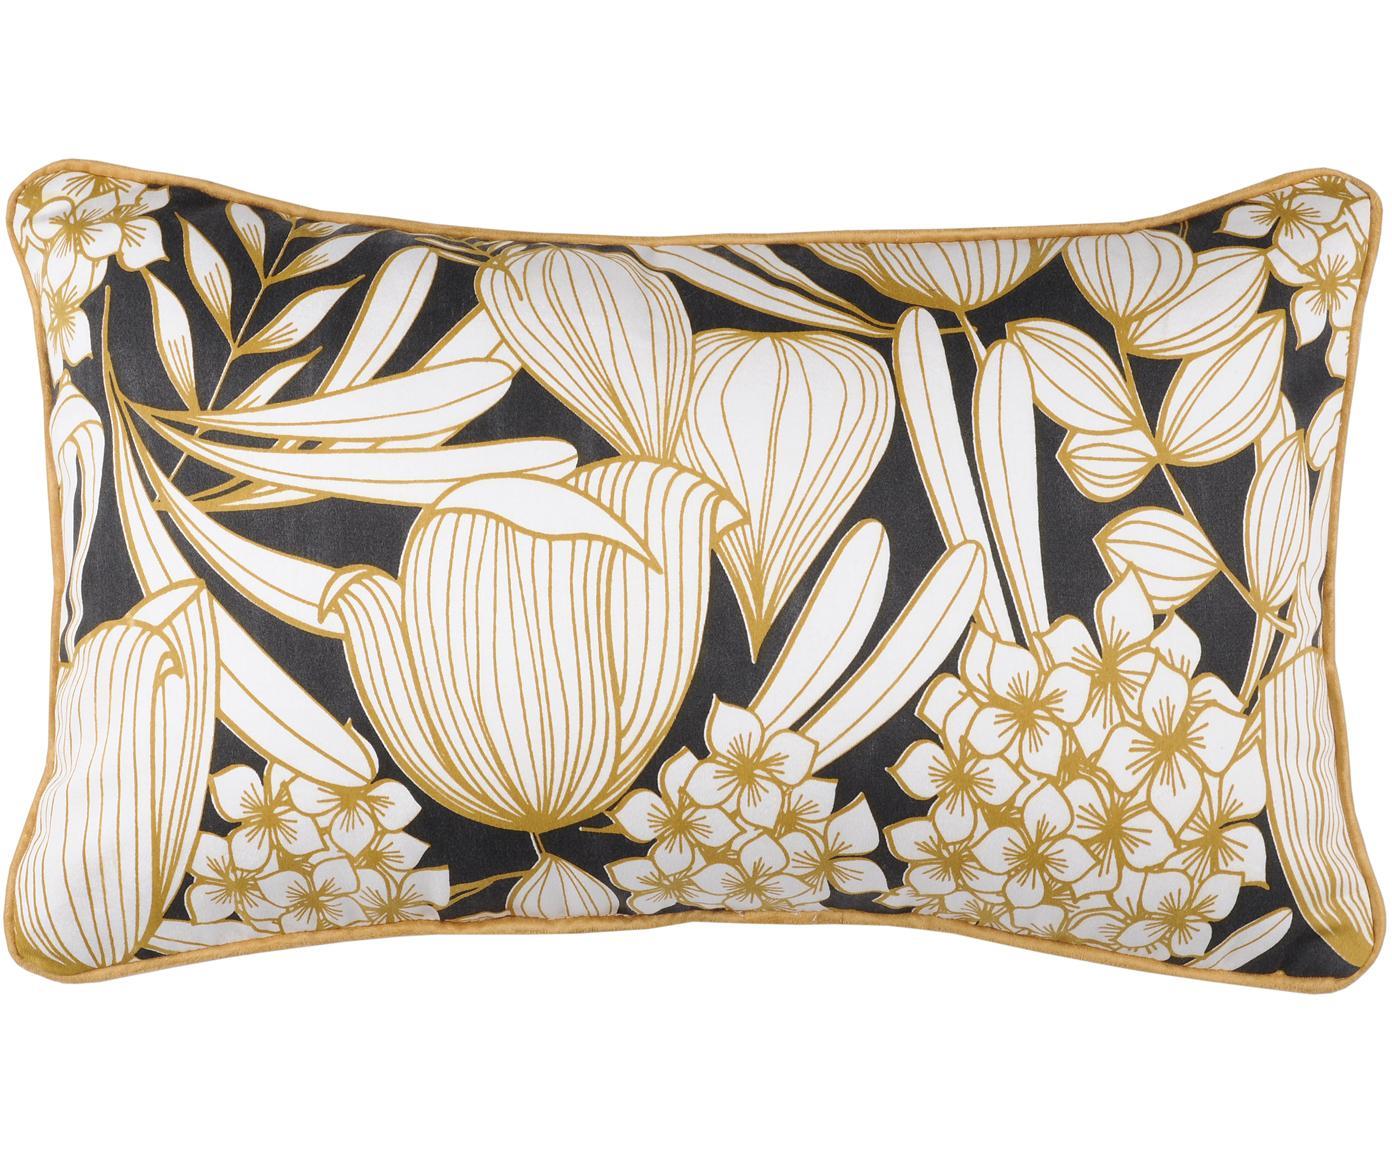 Cojín Ortance, con relleno, Funda: 50%algodón, 50%poliéste, Mostaza, negro, crema, An 30 x L 50 cm